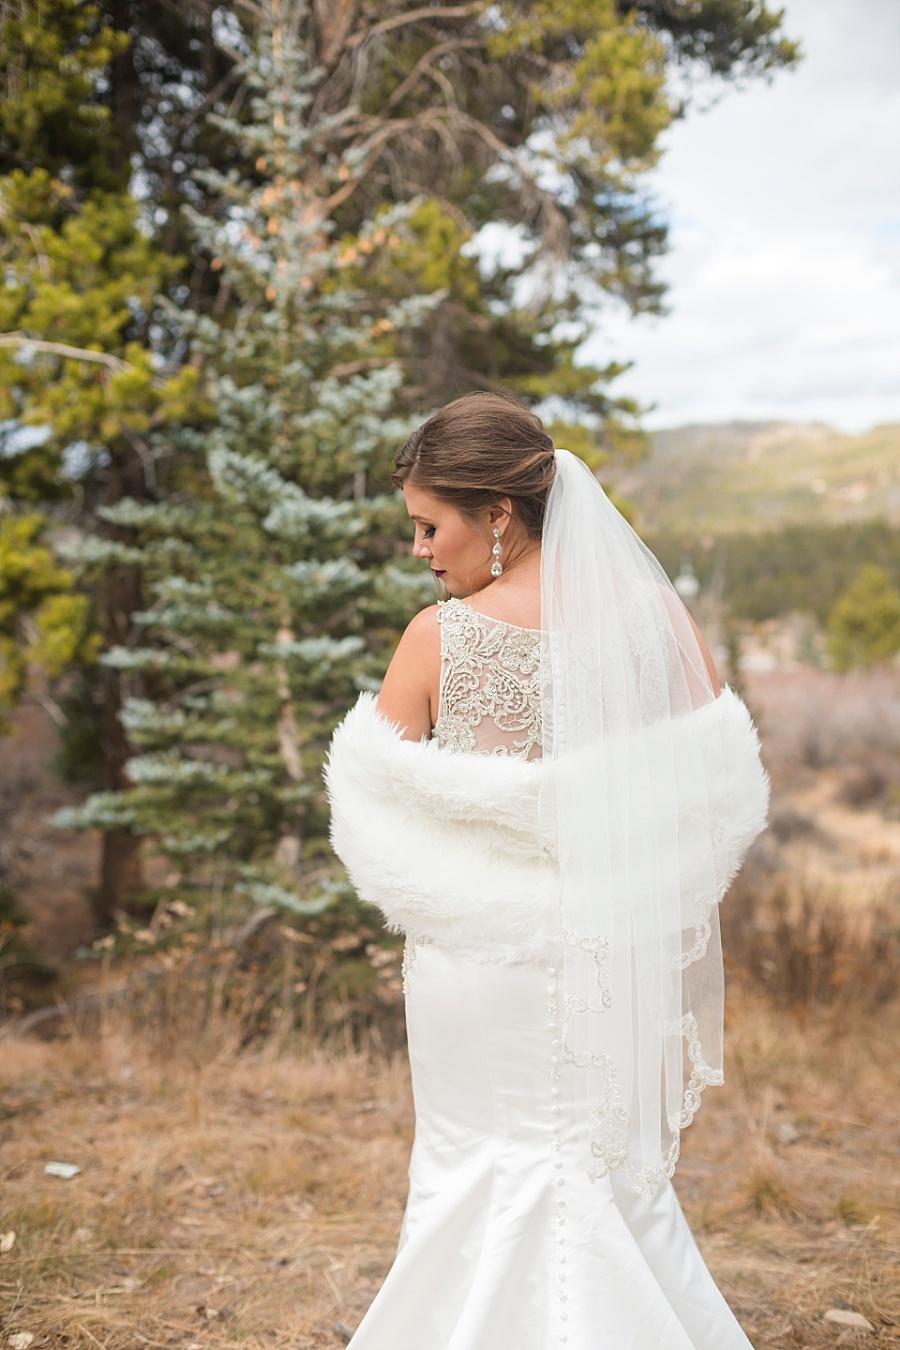 Stacy Anderson Photography Breckenridge Denver Boulder Vail Colorado Travel Lifestyle Elopement Vow renewal Family Wedding Photographer_0024.jpg